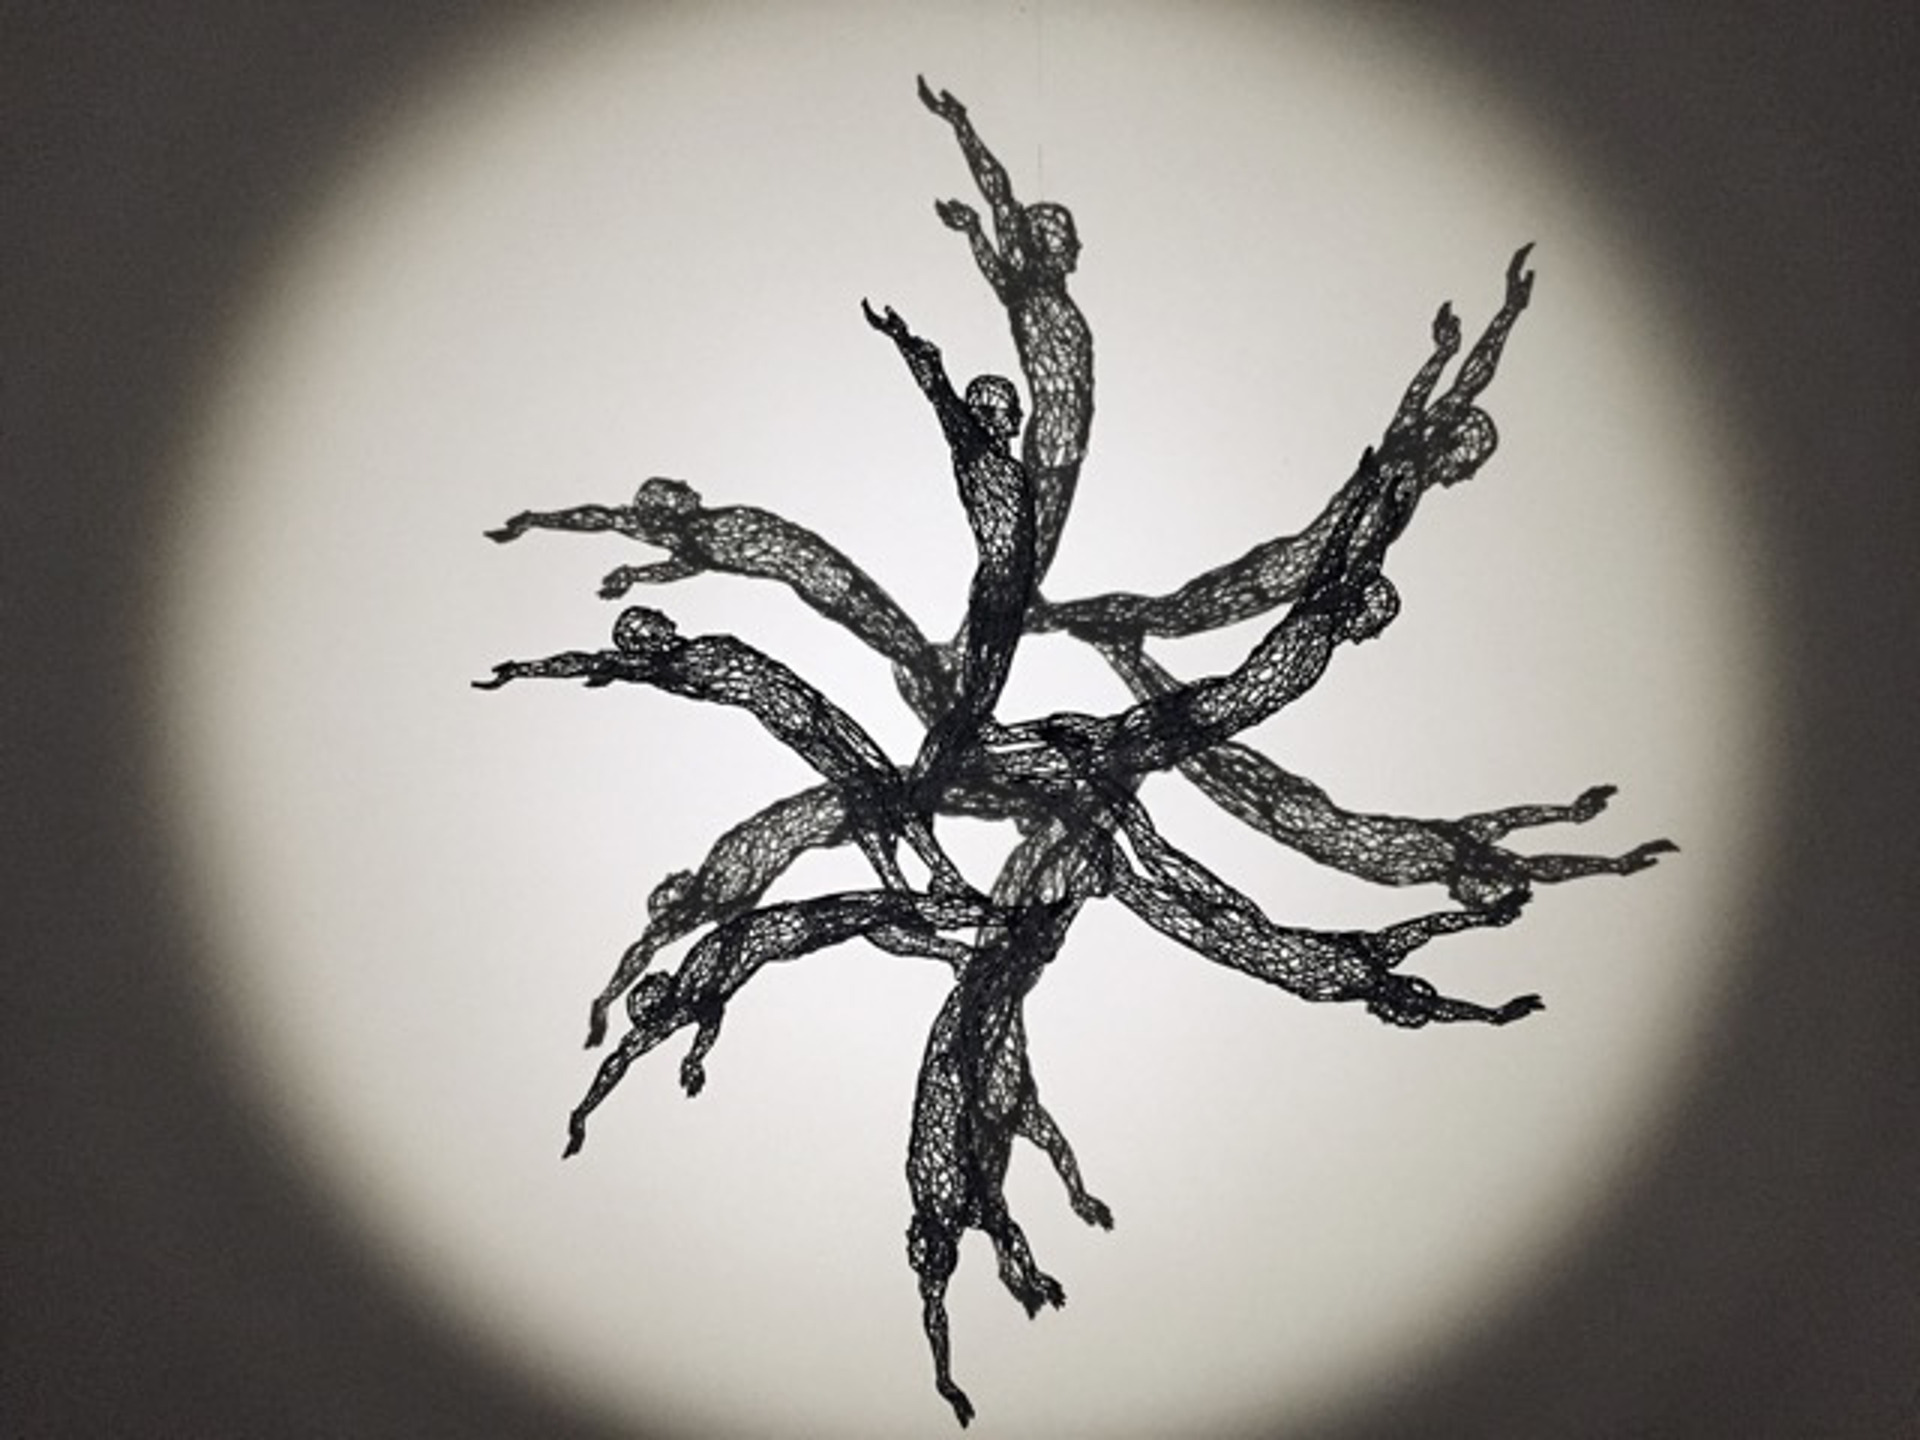 Spiral of Life by Moto Waganari